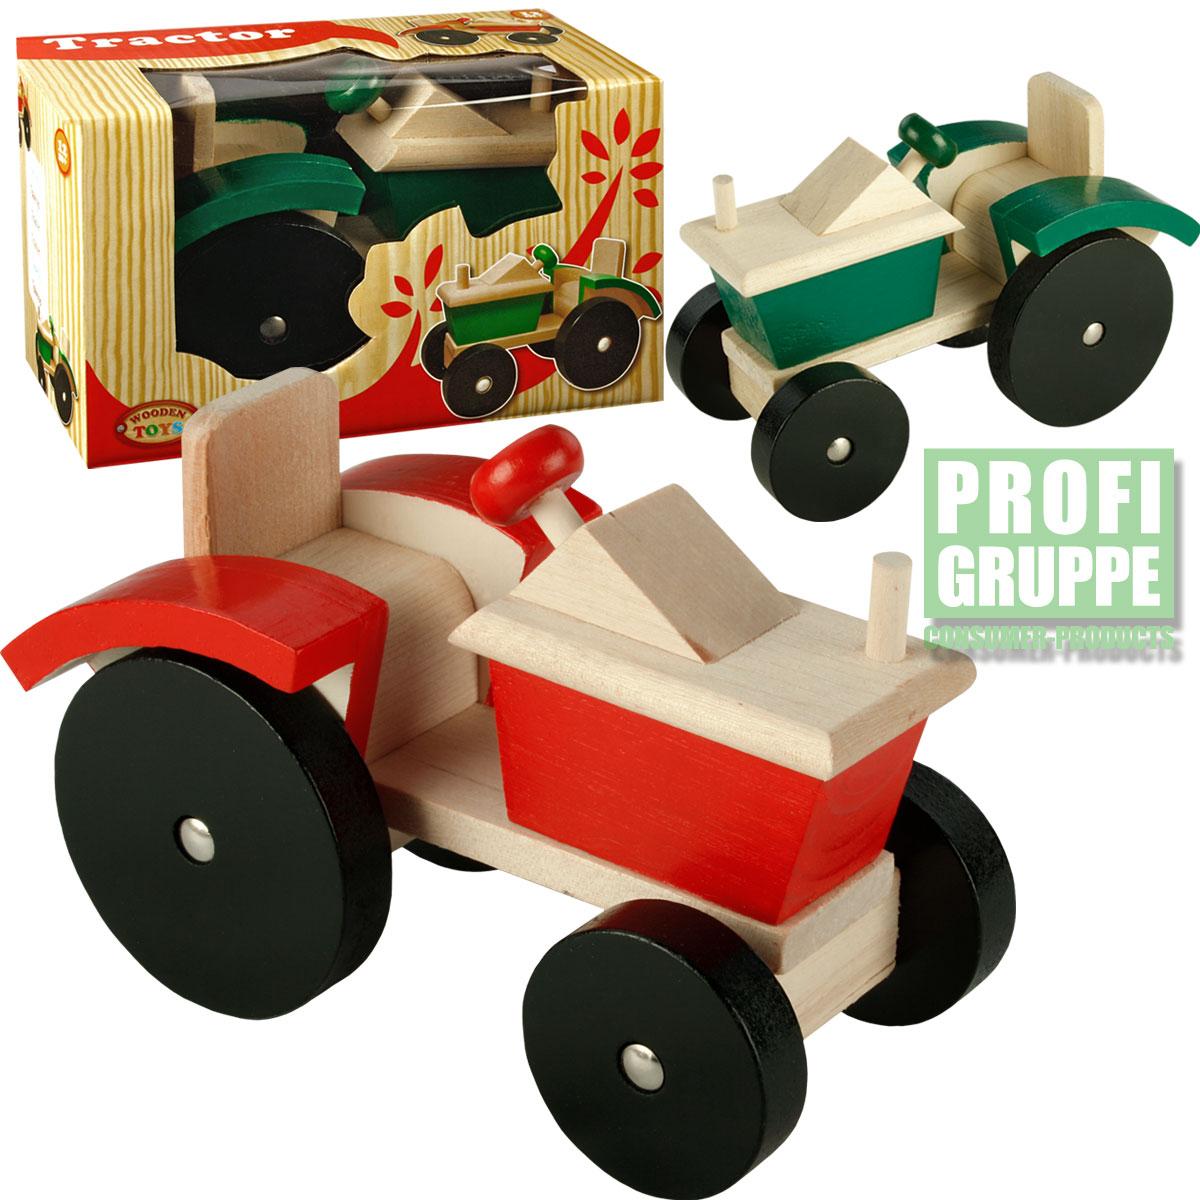 holztraktor traktor trecker bauernhof holzspielzeug spielzeug holz neu ebay. Black Bedroom Furniture Sets. Home Design Ideas